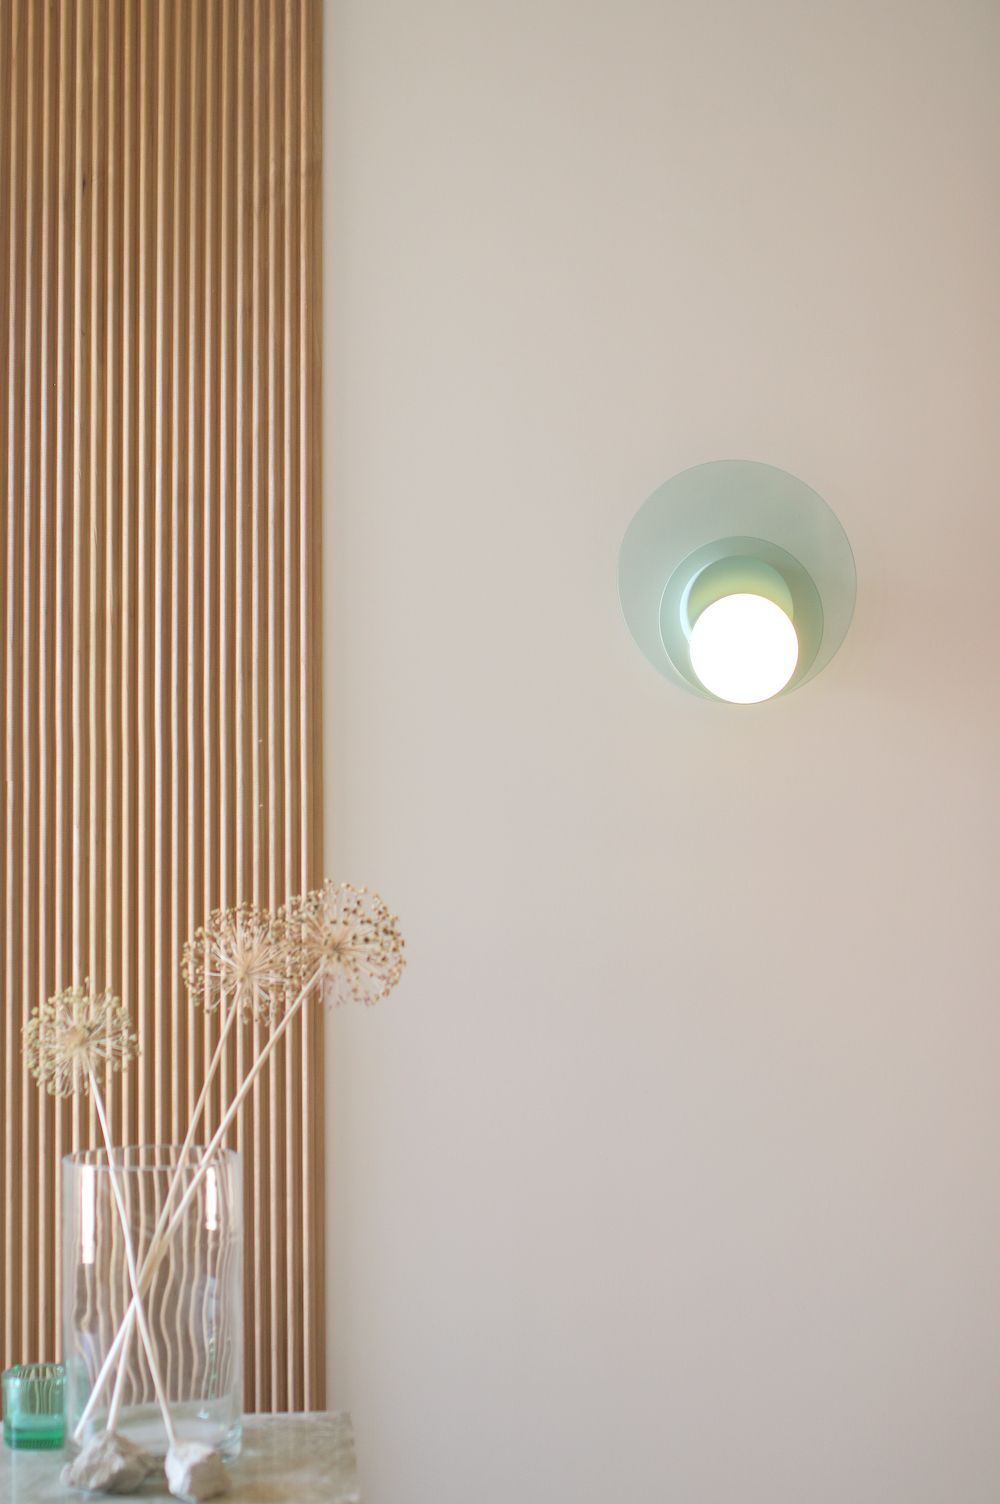 Epingle Sur Luminaire Design